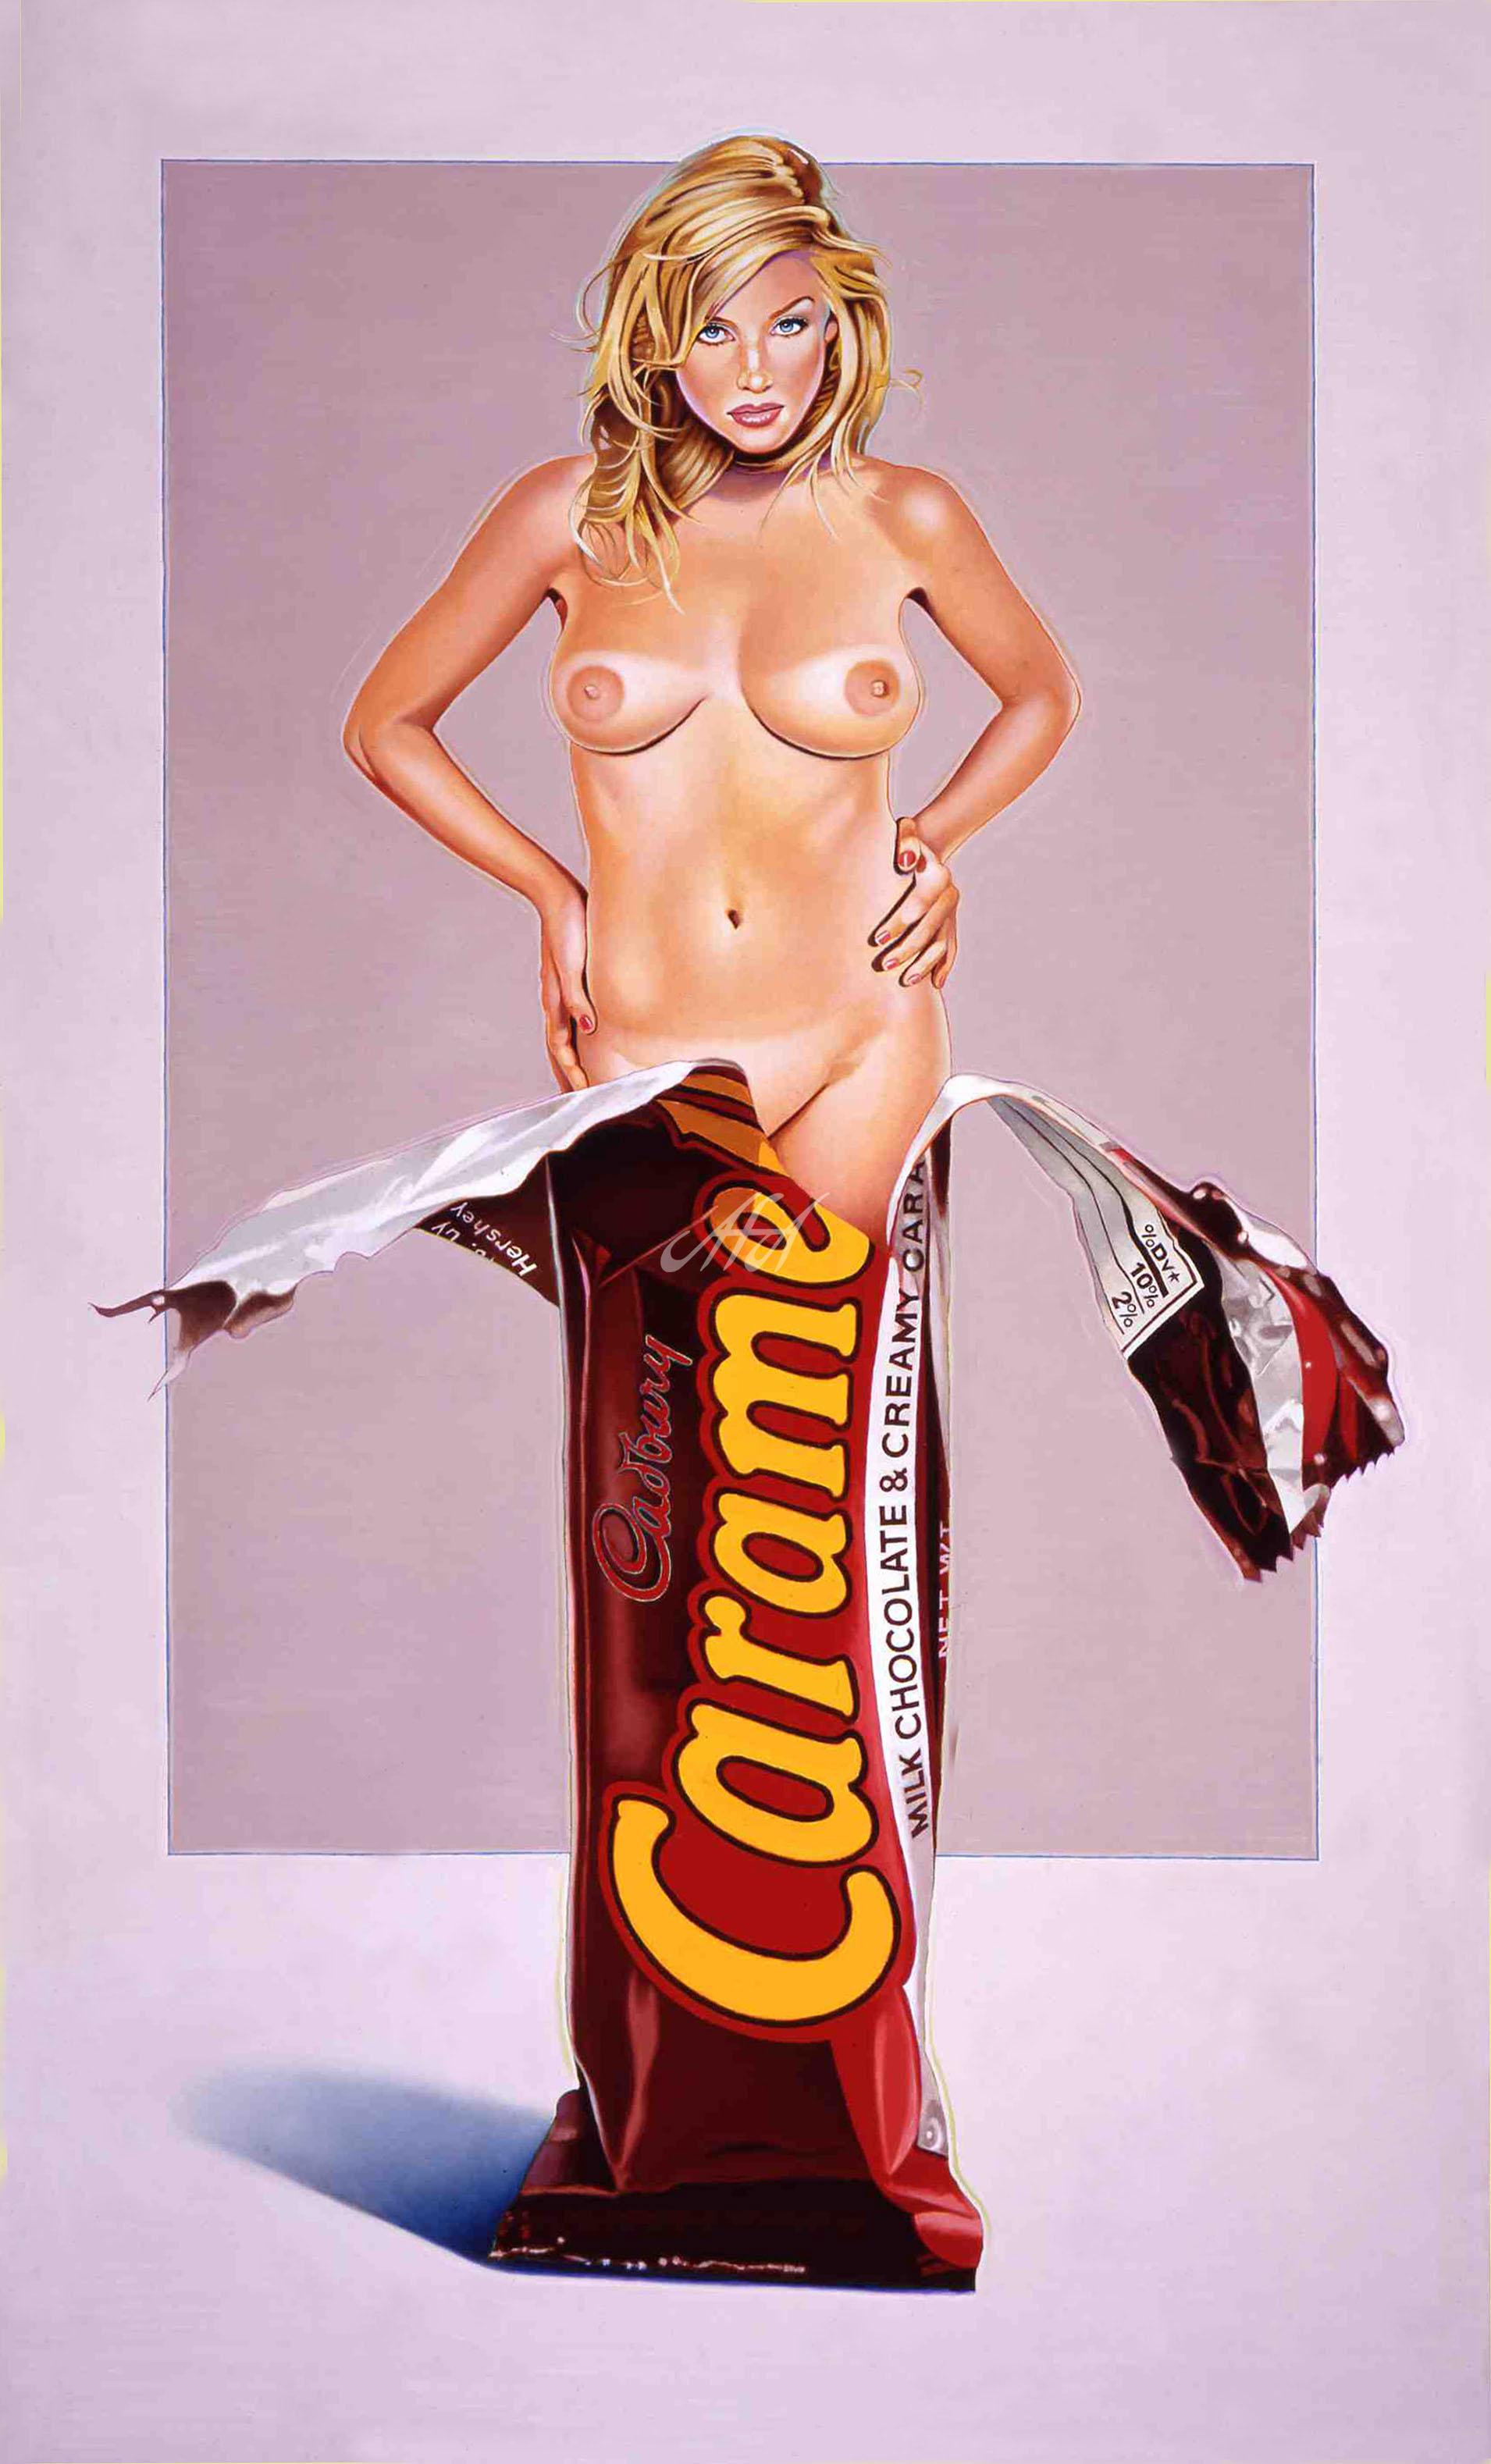 Mel Ramos - Caramia Caramello watermark.jpg